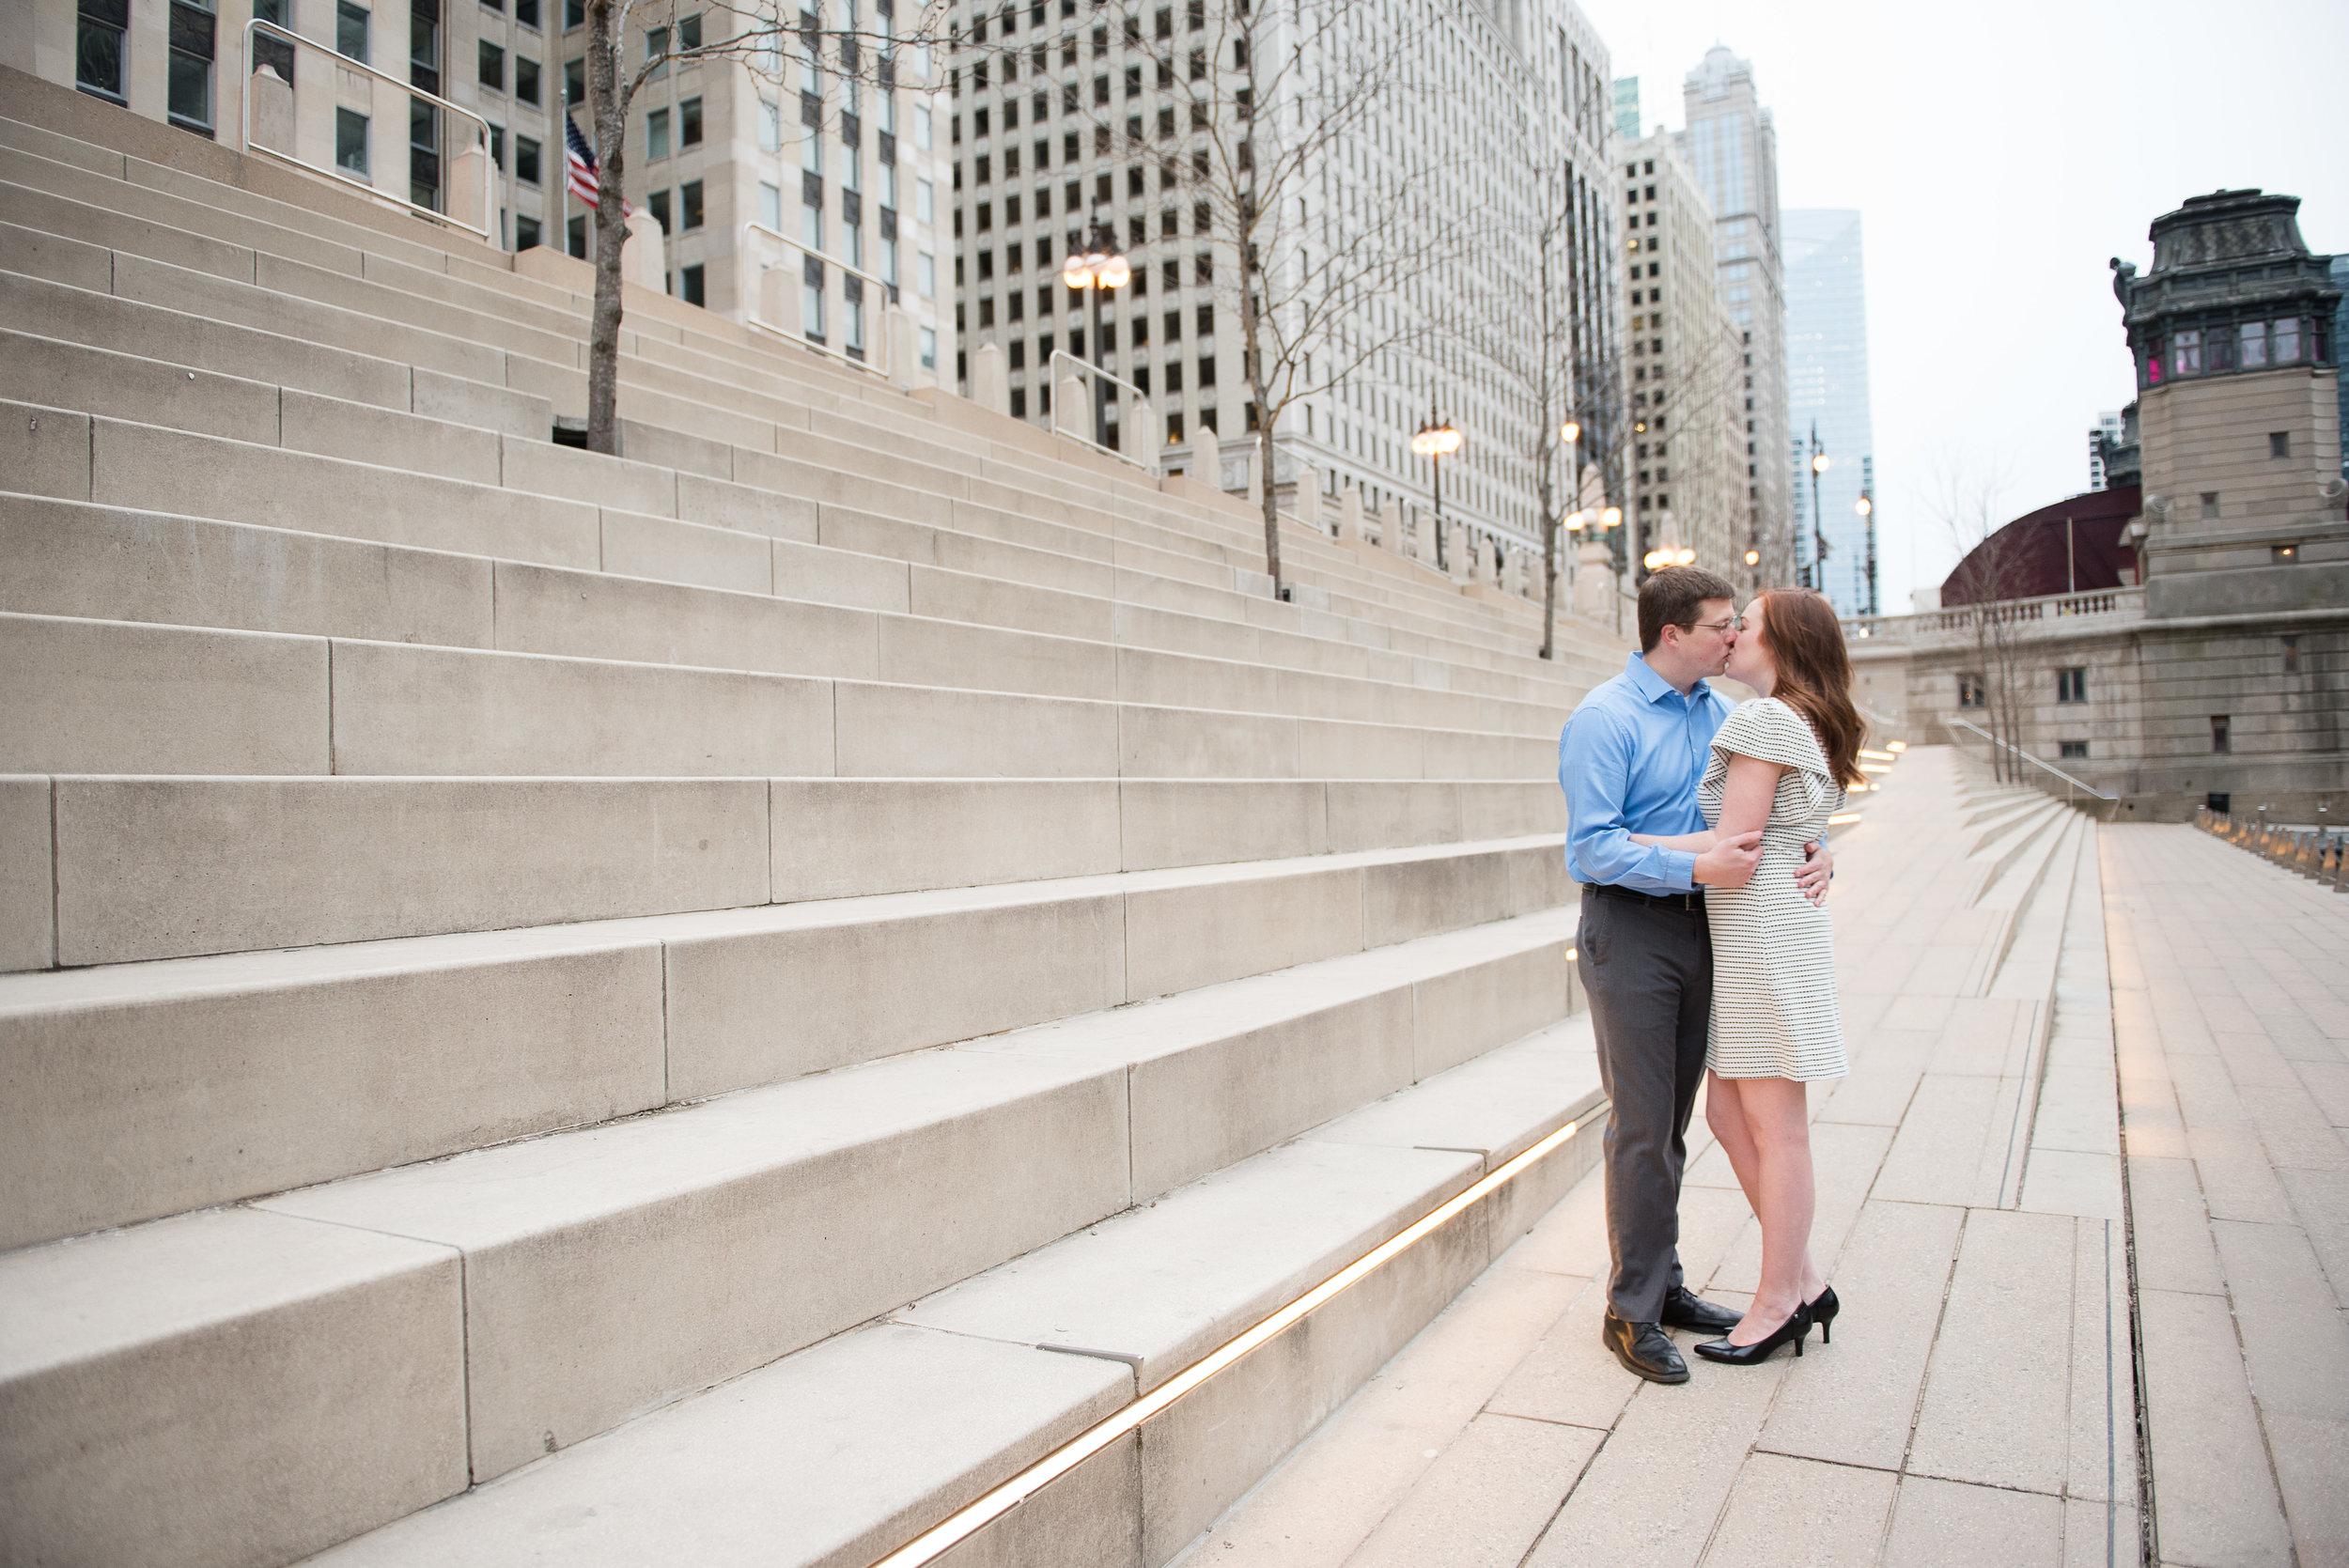 chicago-engagement-photography-metts-photo-11.jpg